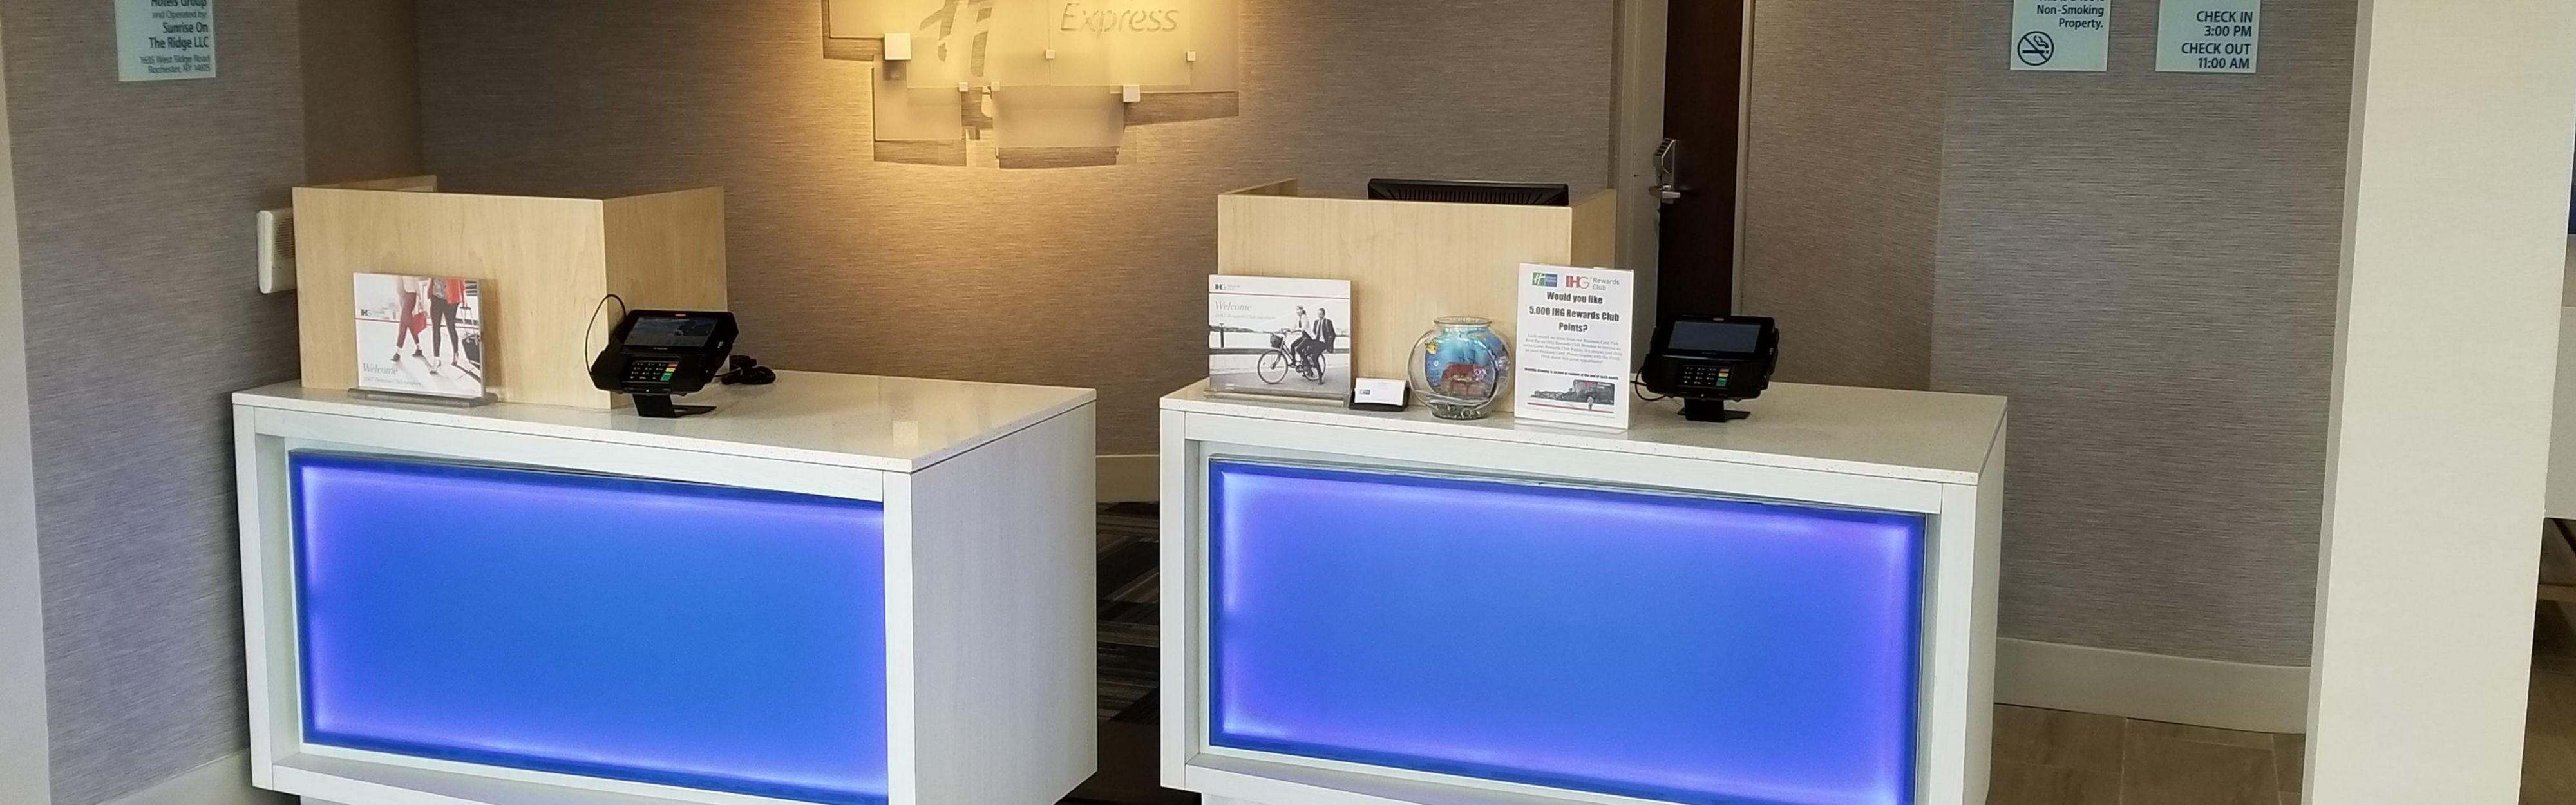 Holiday Inn Express Rochester - Greece image 0